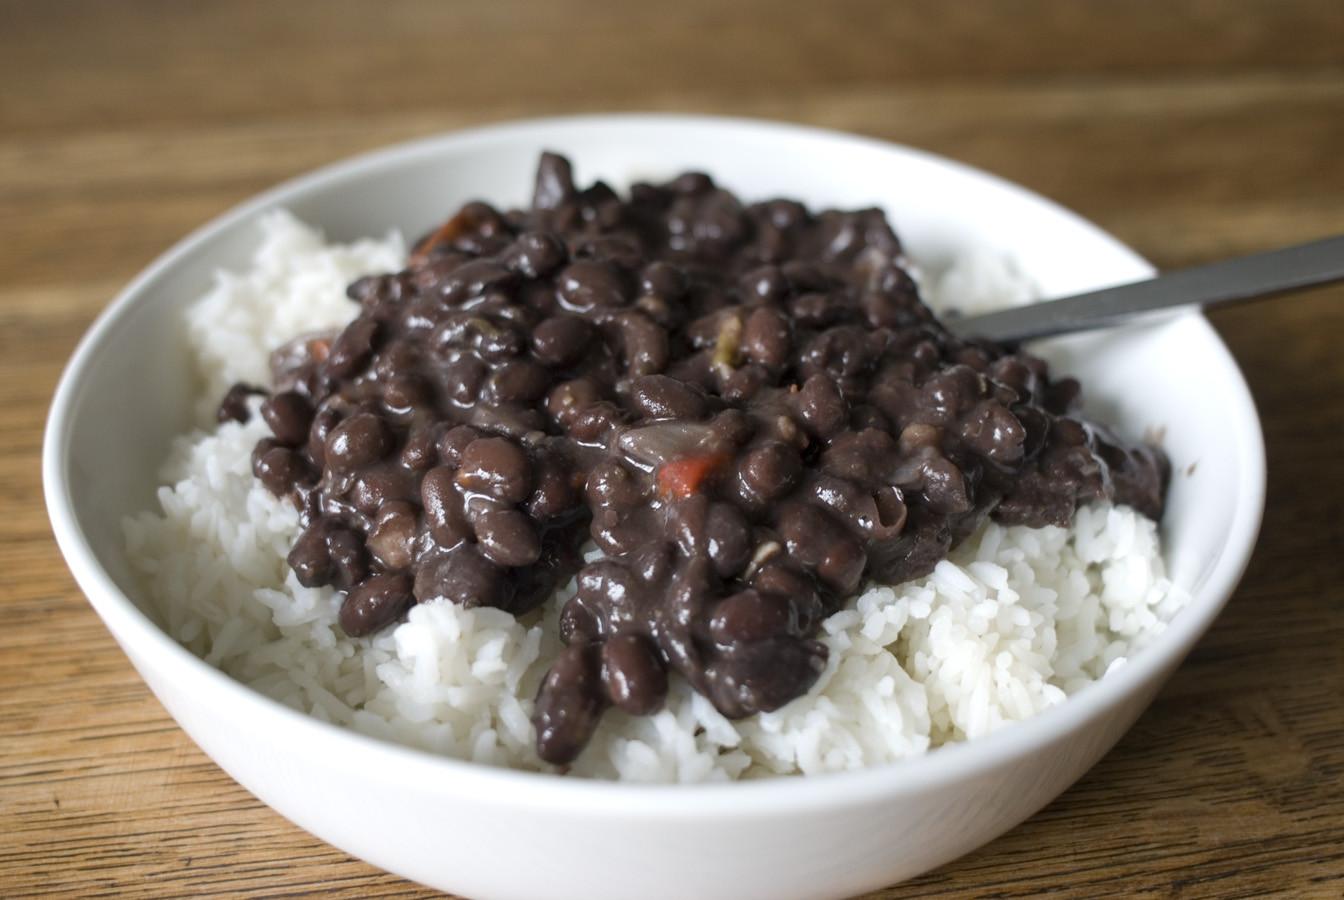 Cuban Black Beans And Rice  Simmering Over the Kolz Noche Buena de Cuba